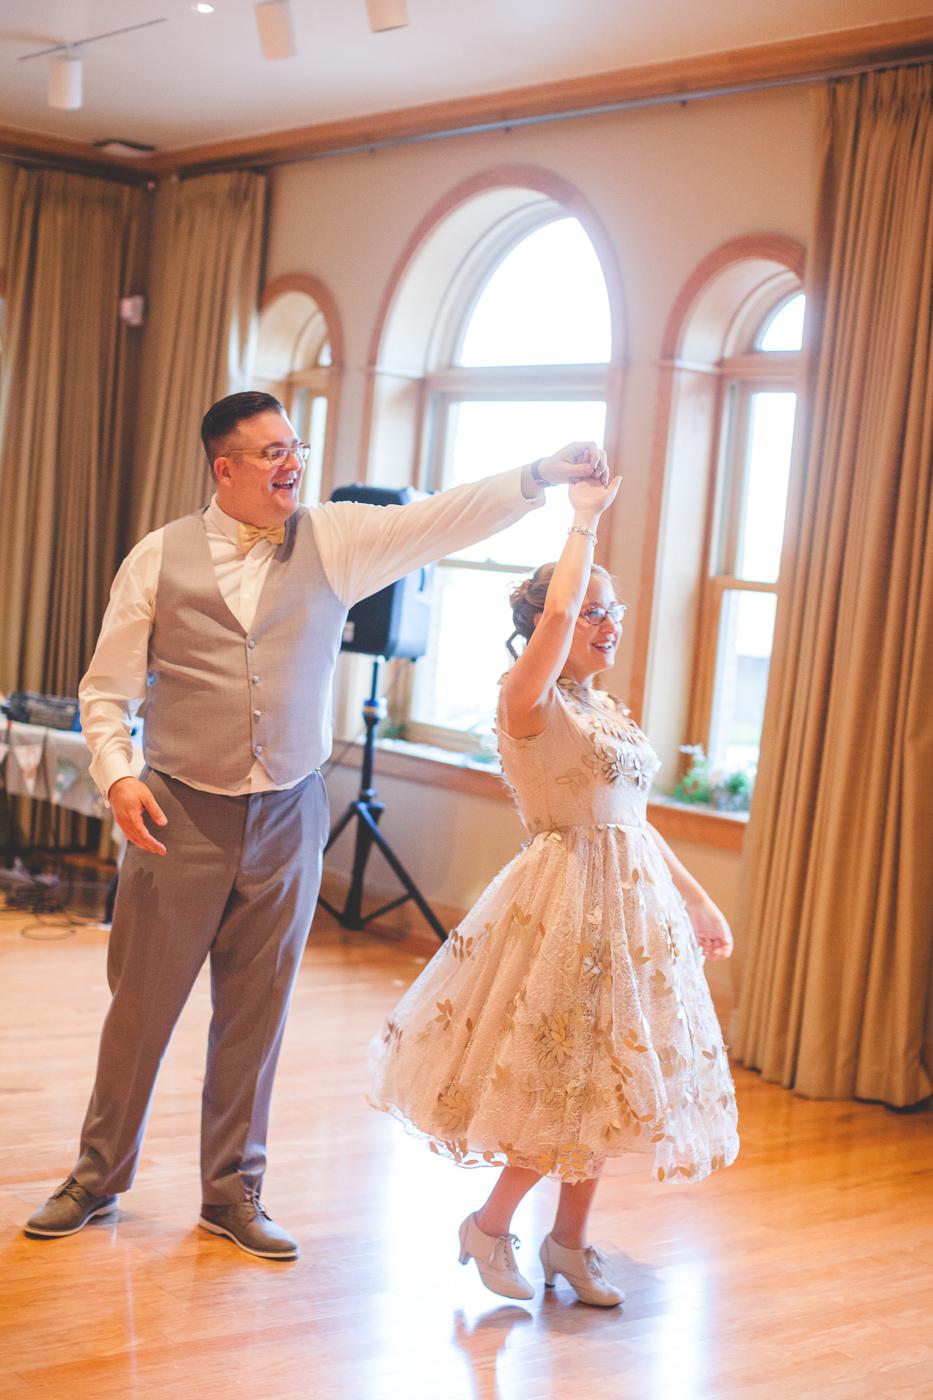 chotronette wedding dress